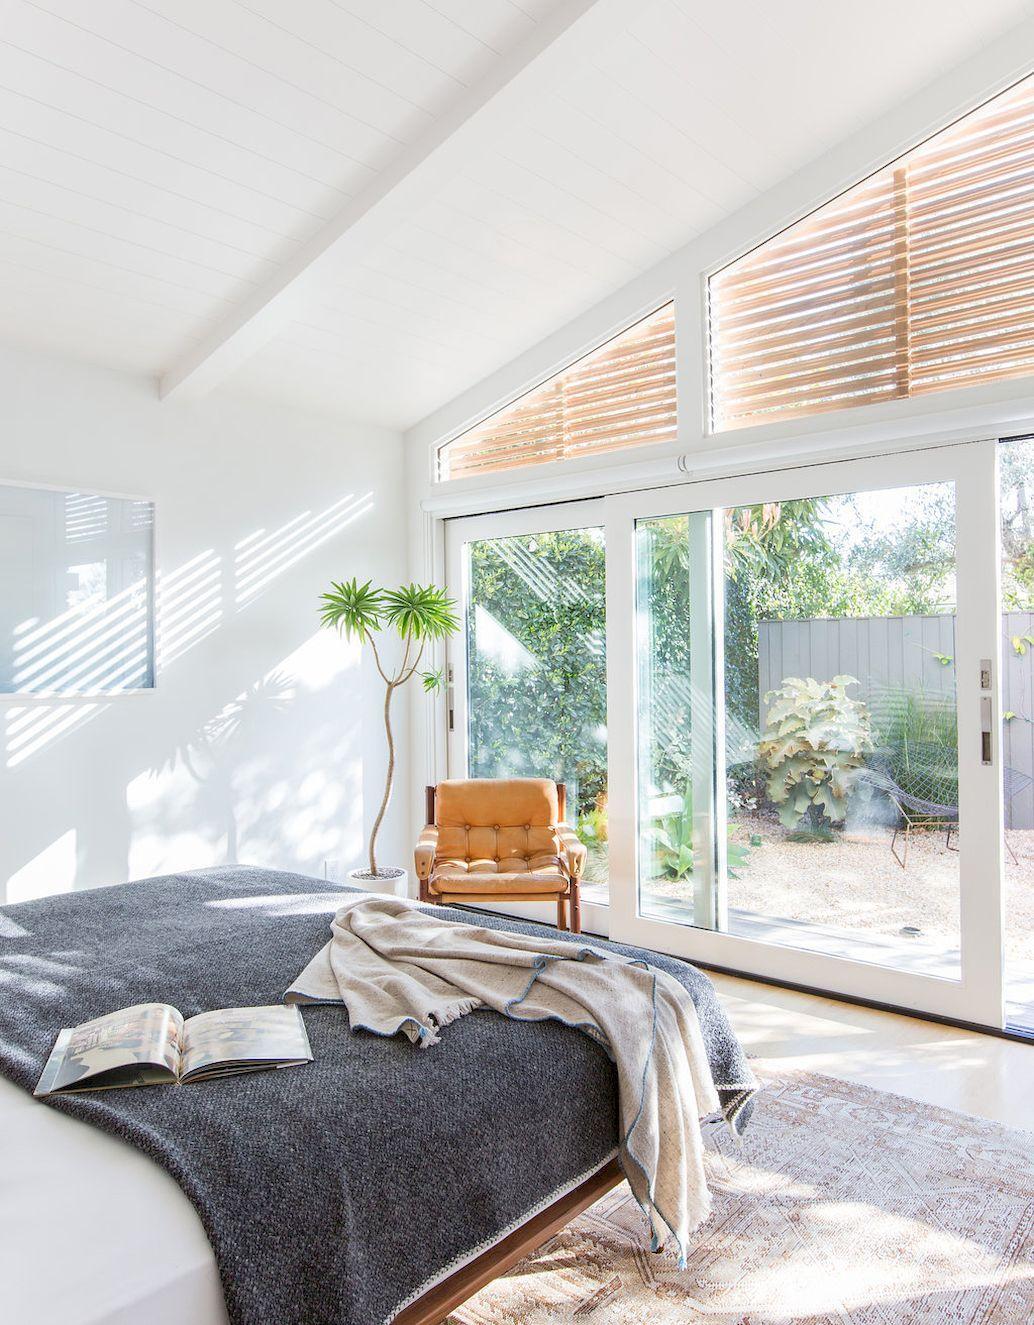 Stunning mid century modern minimalist interior design by amber interior design samples